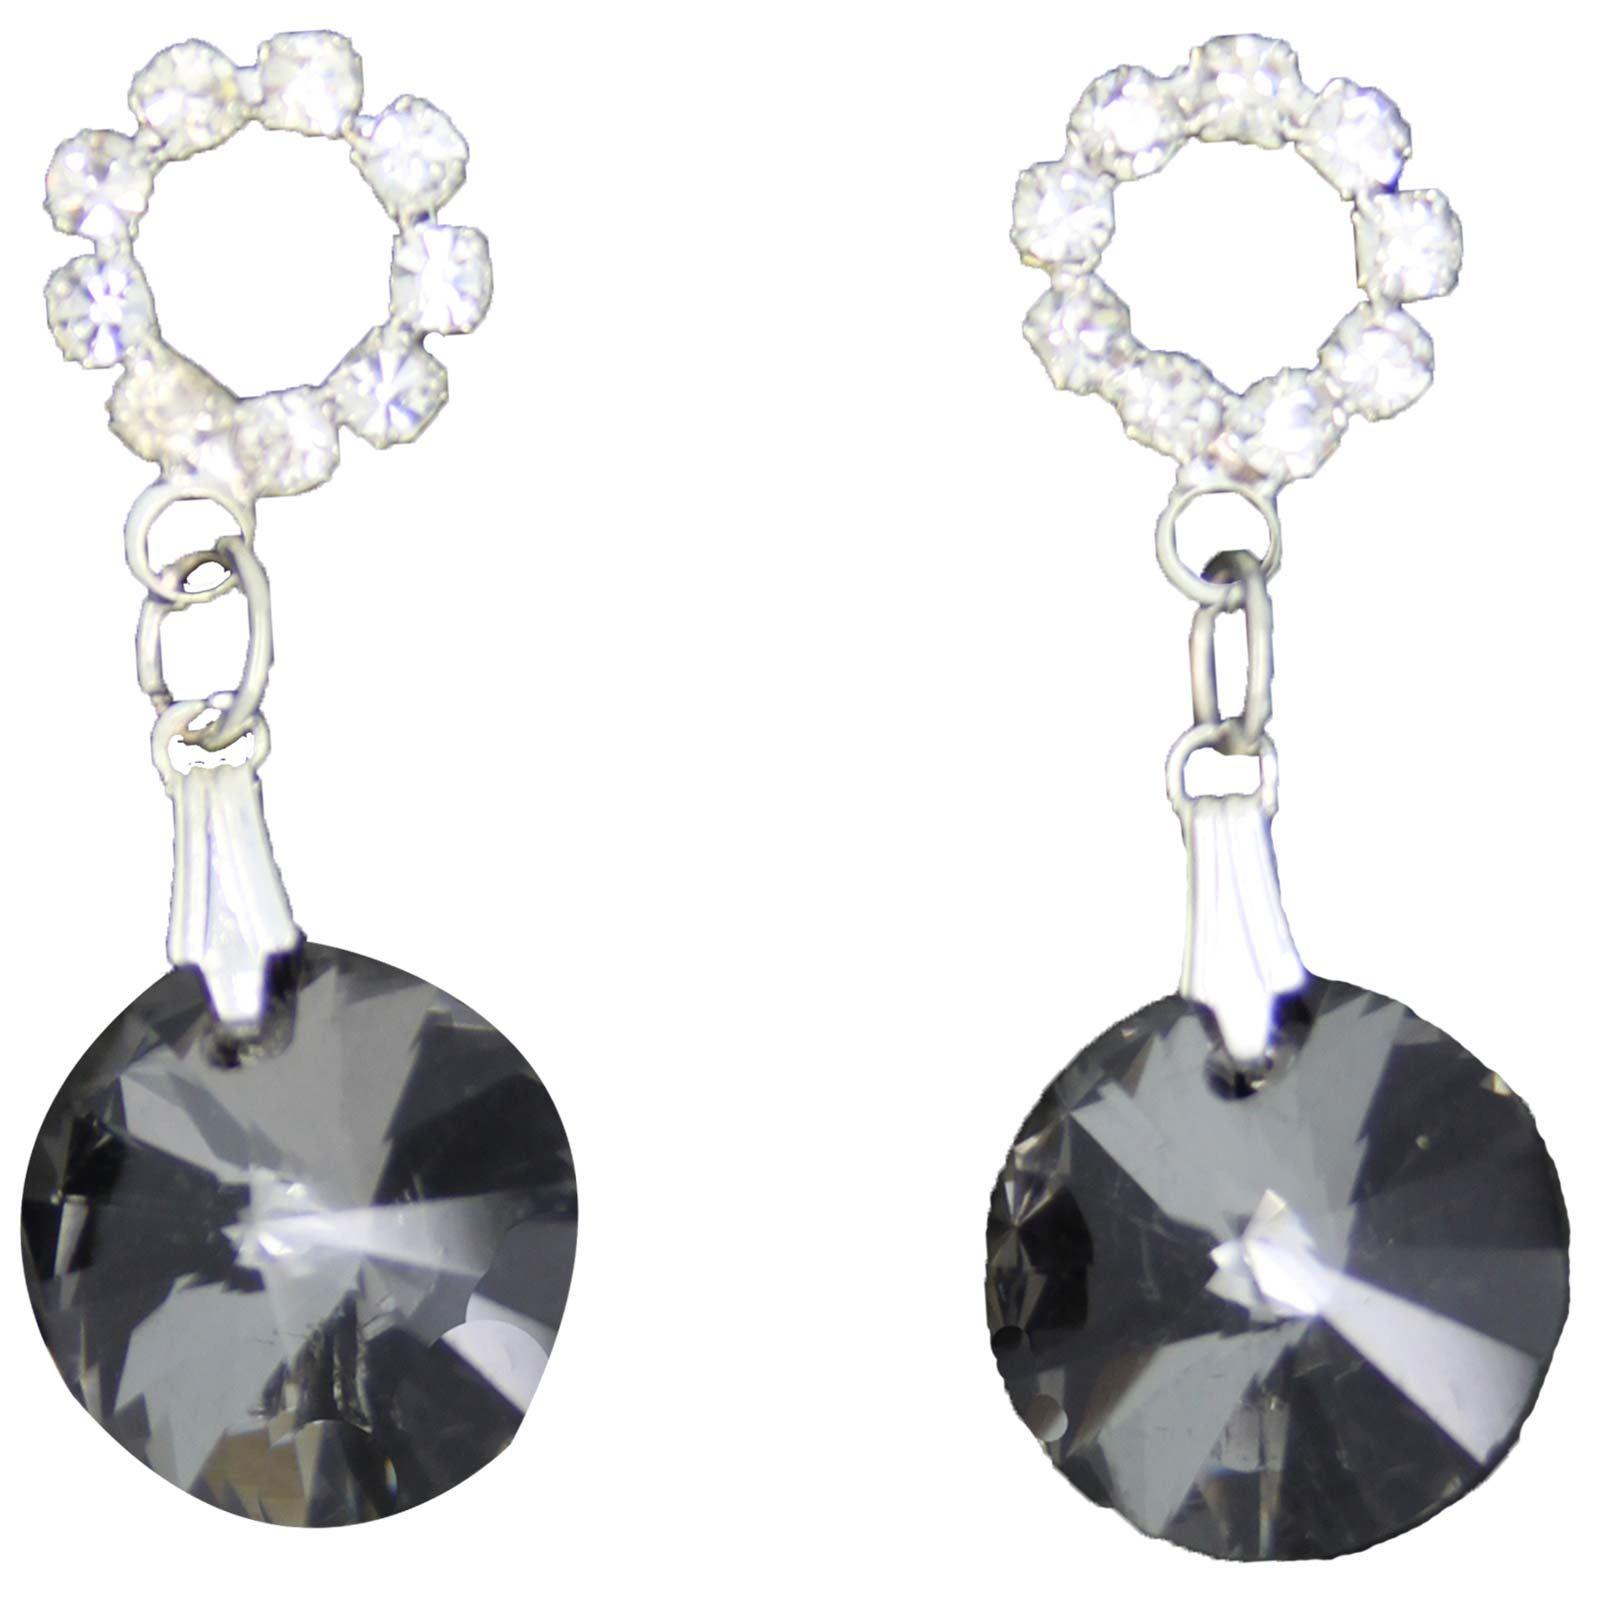 True-Face-Ladies-Women-039-s-Elegant-Earrings-Necklace-Set-Metal-Alloy-Jewellery thumbnail 12